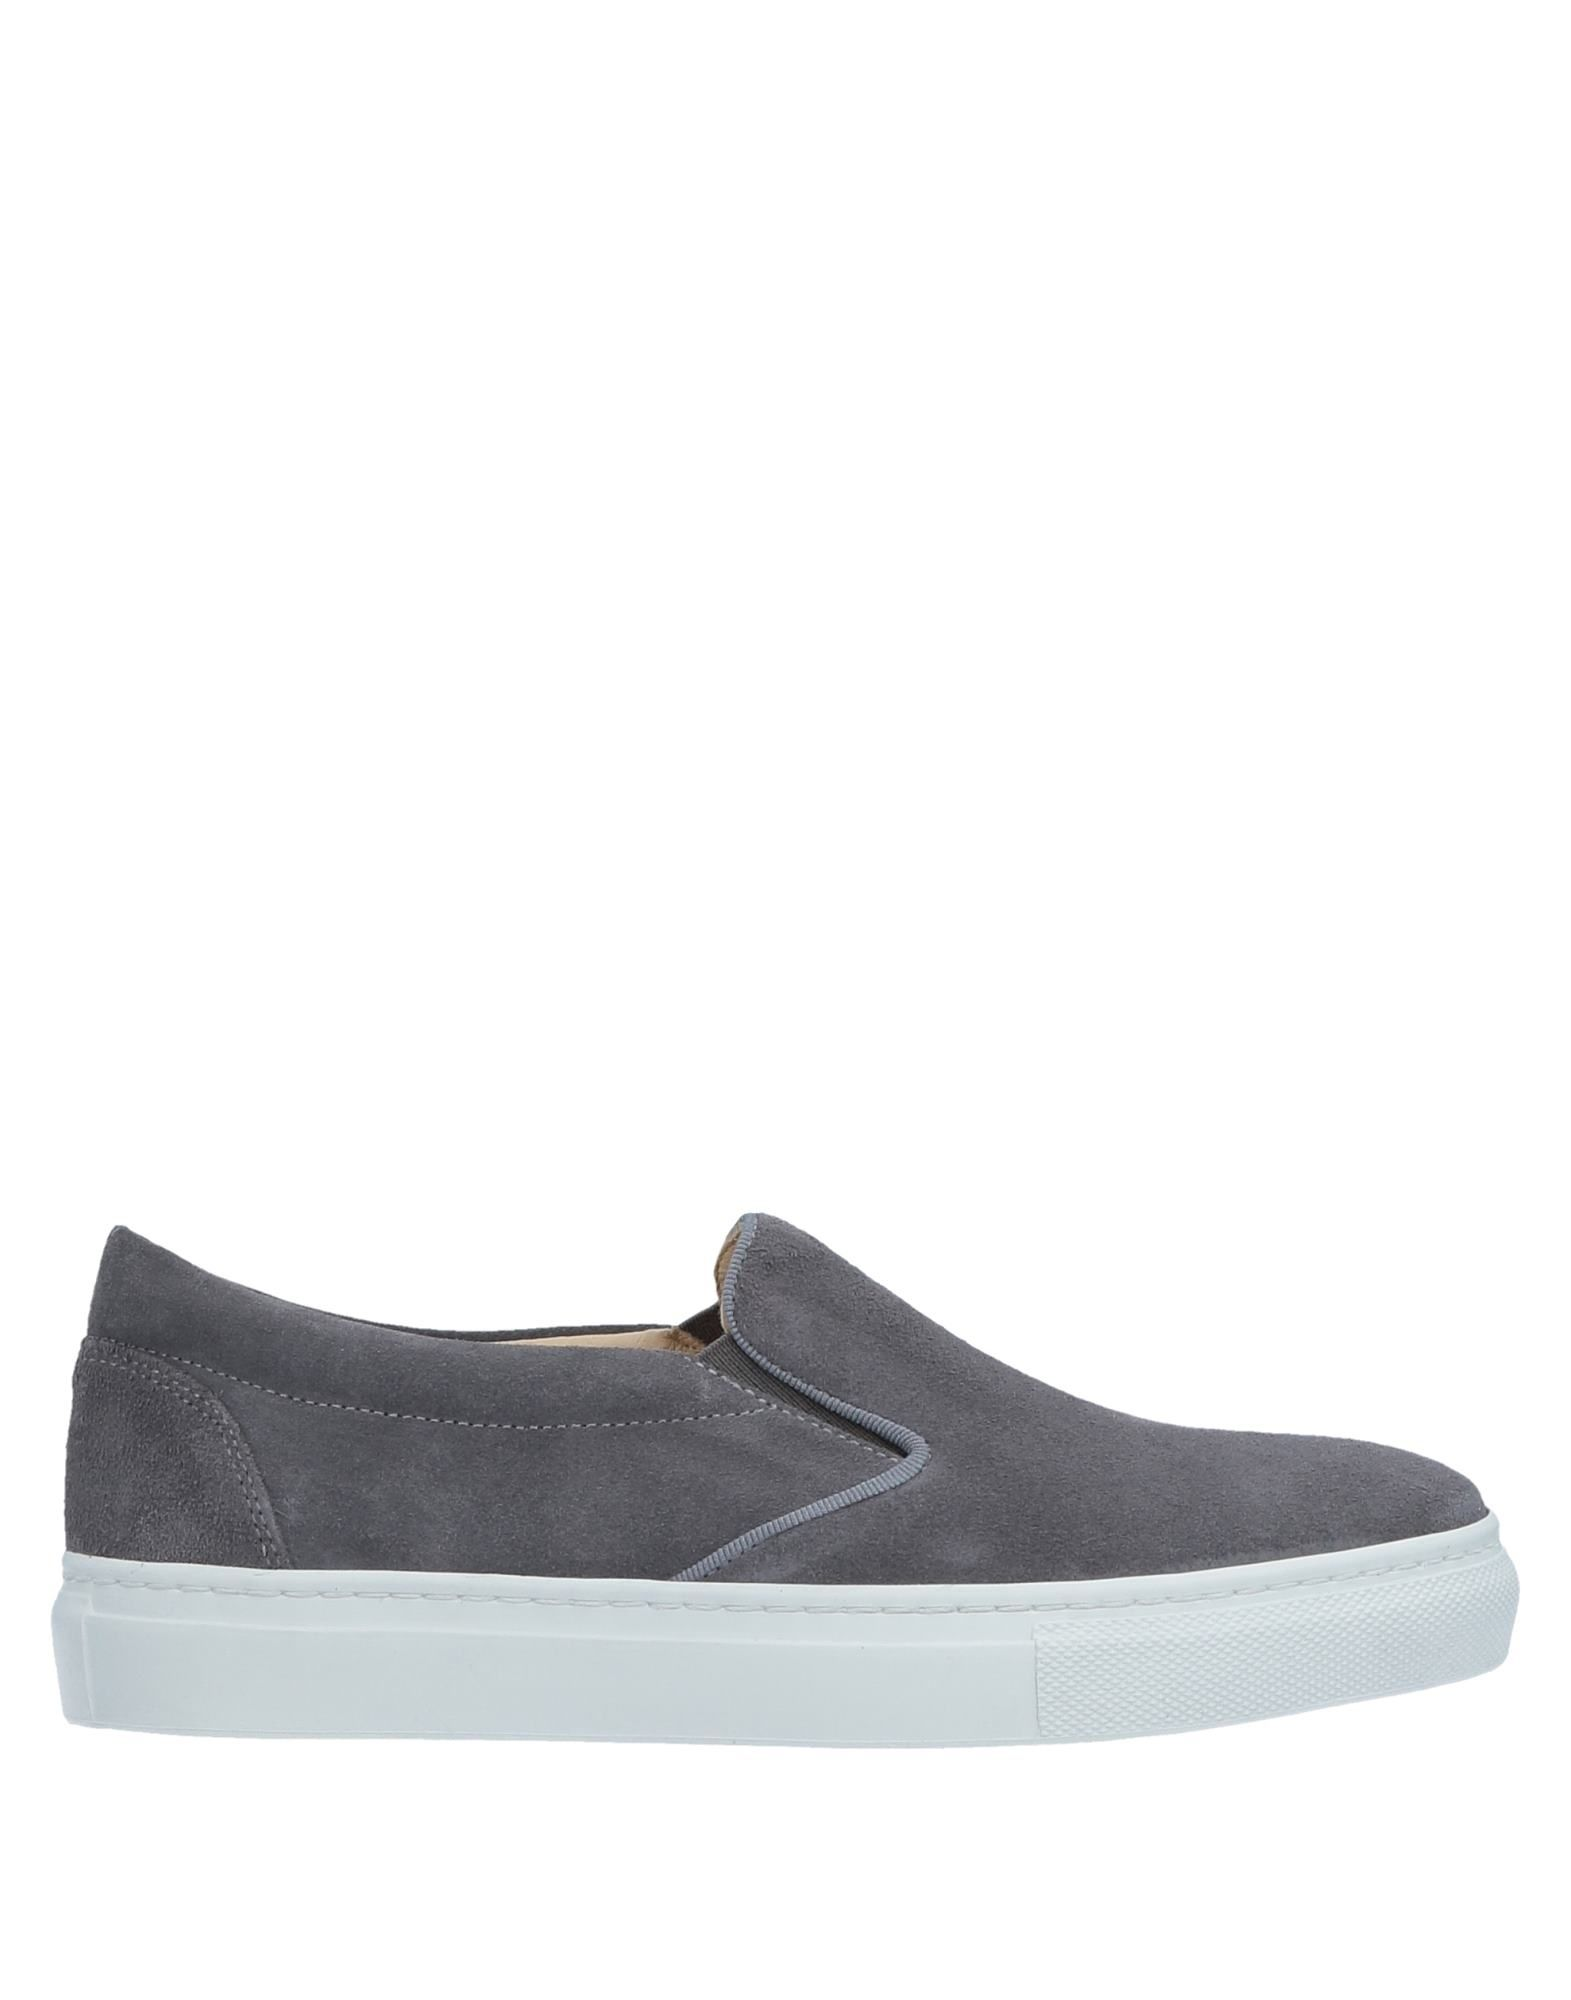 Gut um billige Schuhe zu tragenPaolo Simonini Sneakers Damen  11516265XL